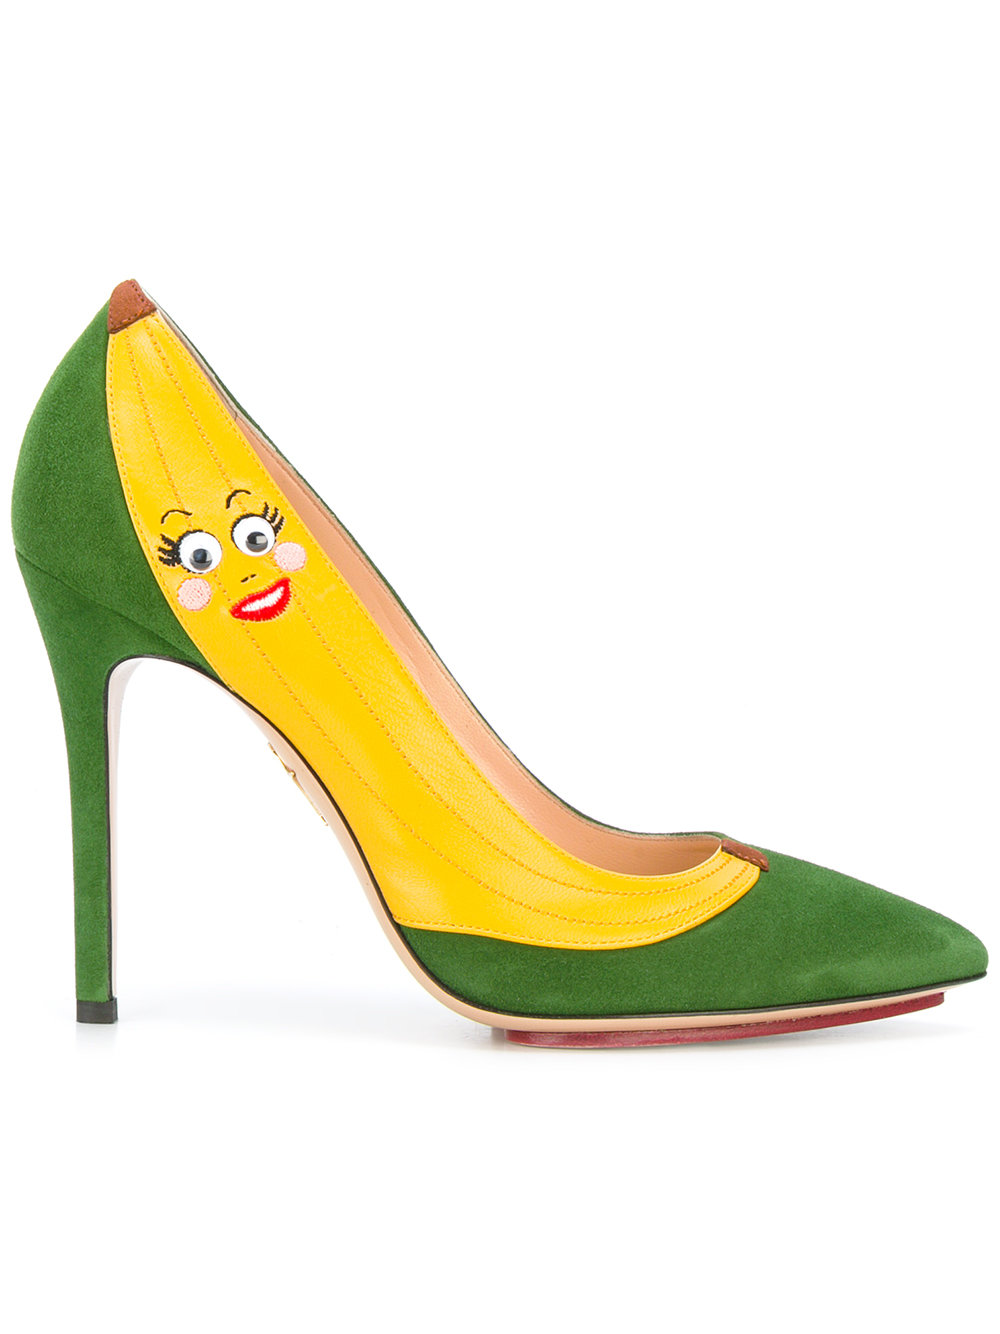 CHARLOTTE OLYMPIA Banana pumps, FarFetch.com